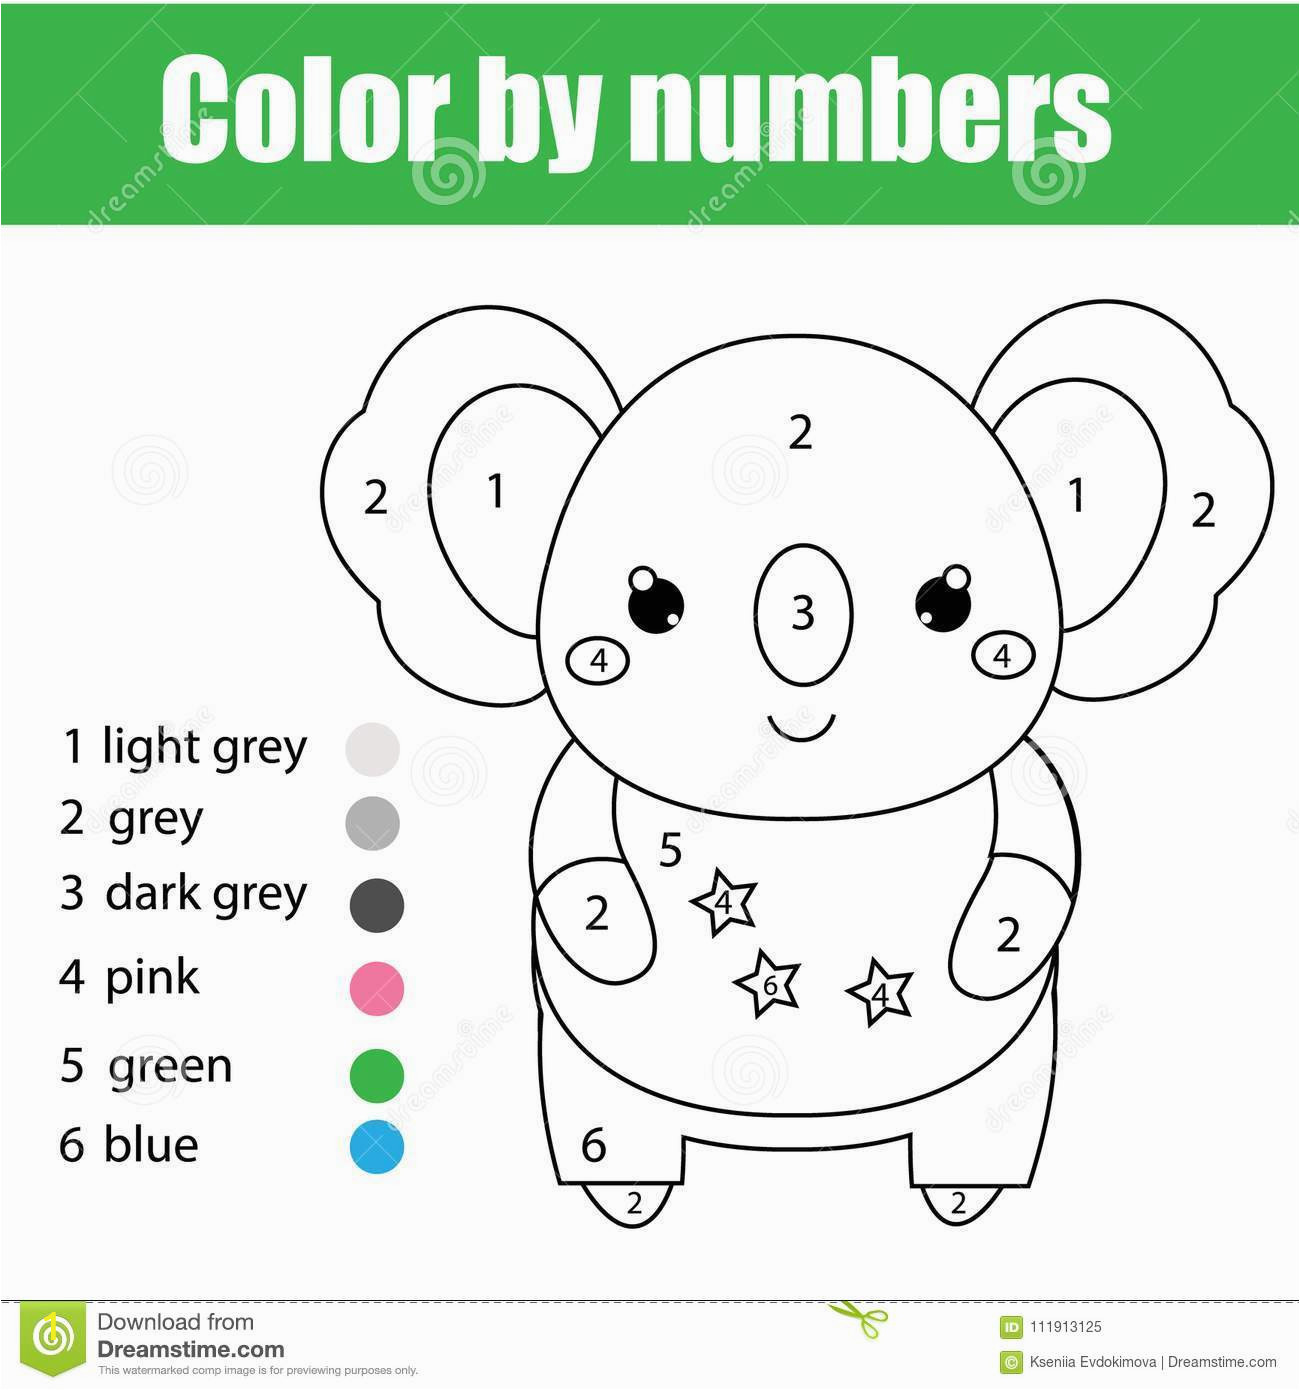 children educational game coloring page cute koala color numbers printable activity worksheet toddlers pre school